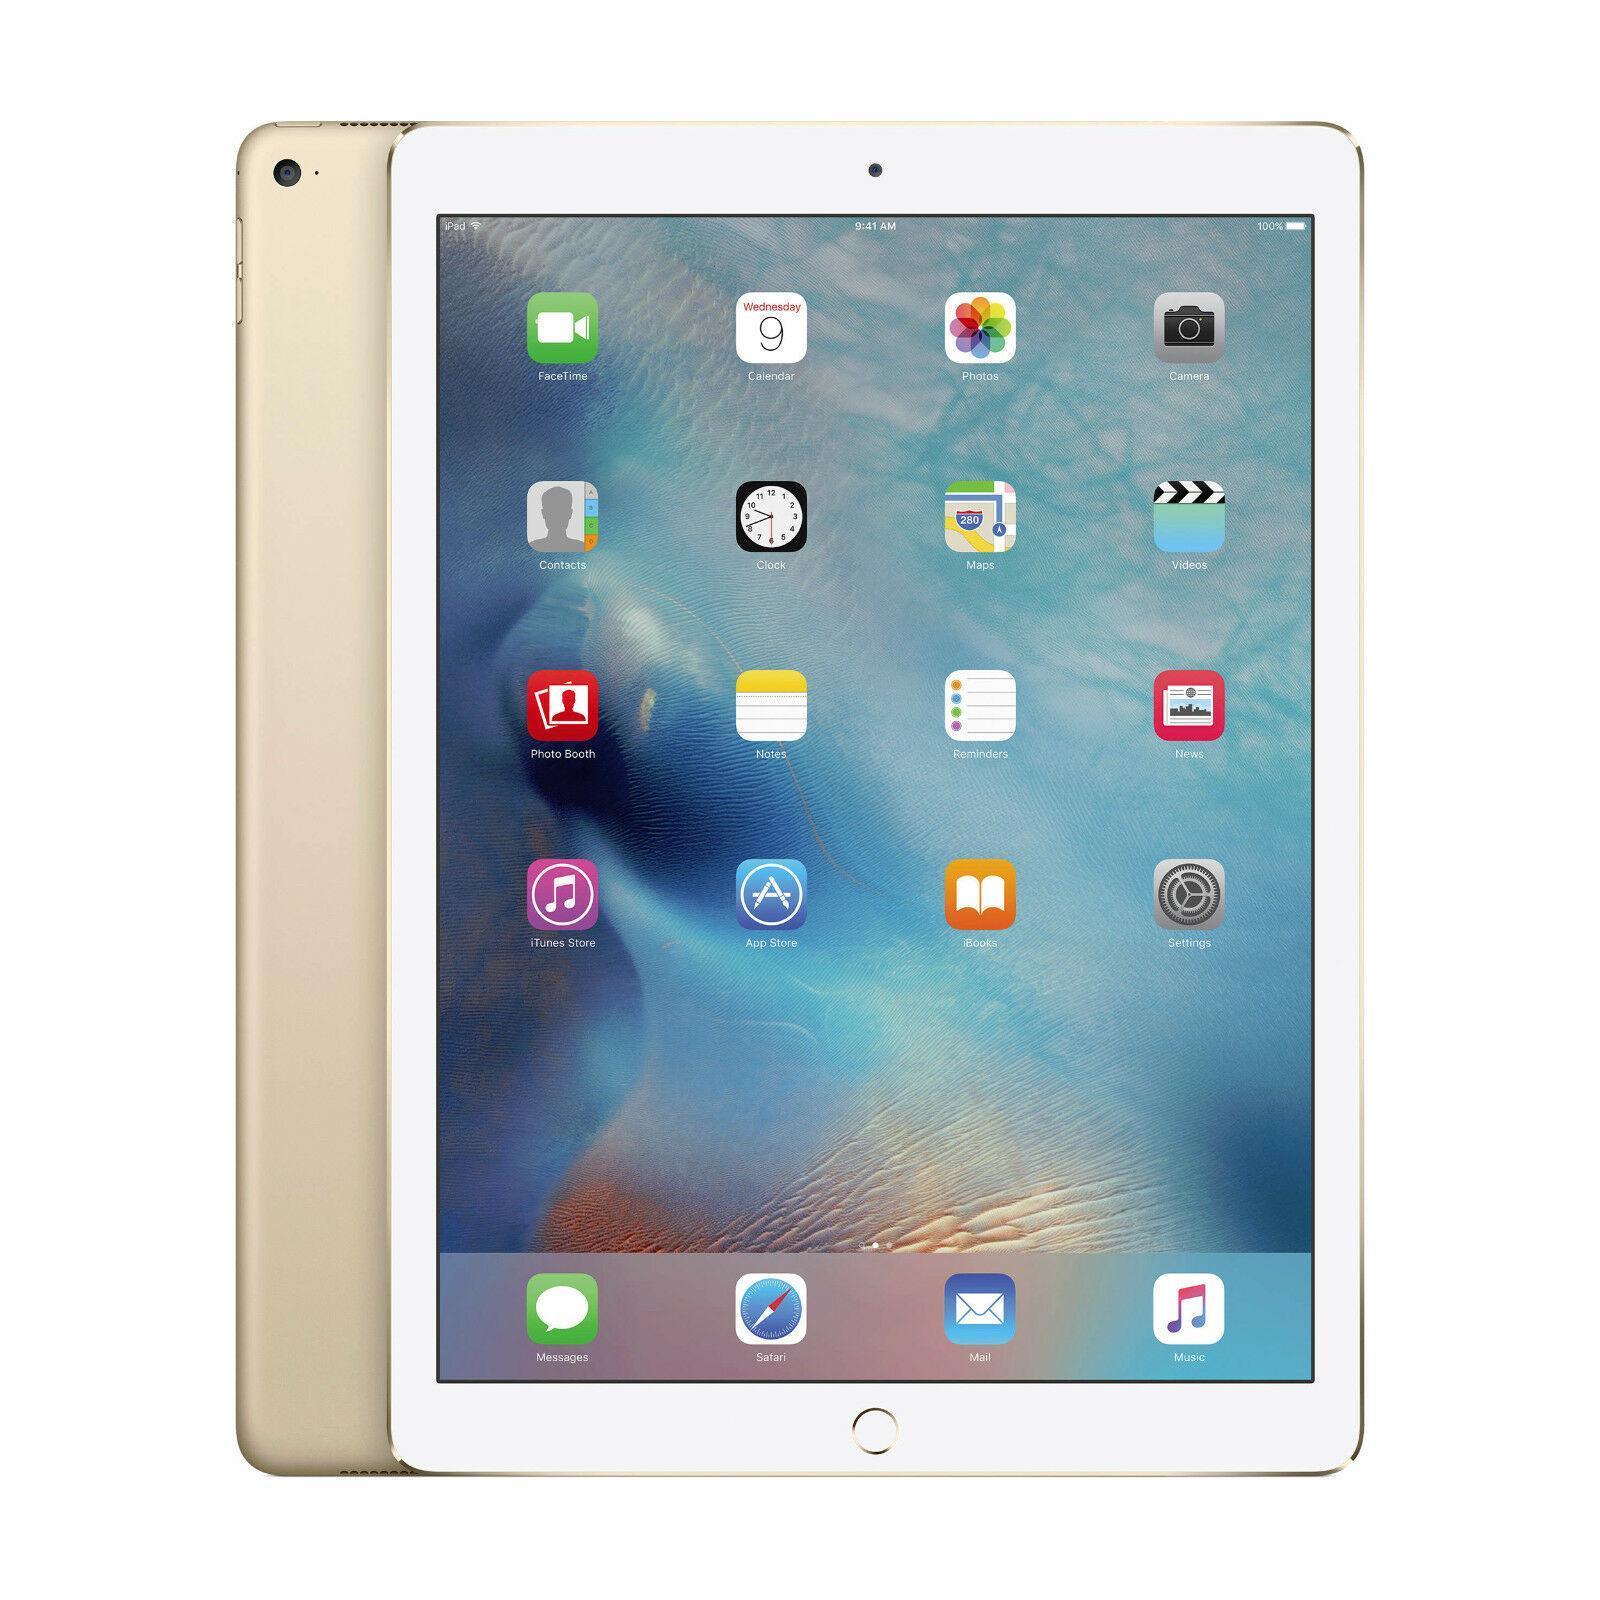 "iPad Pro 12,9"" (2017) - WLAN + LTE"